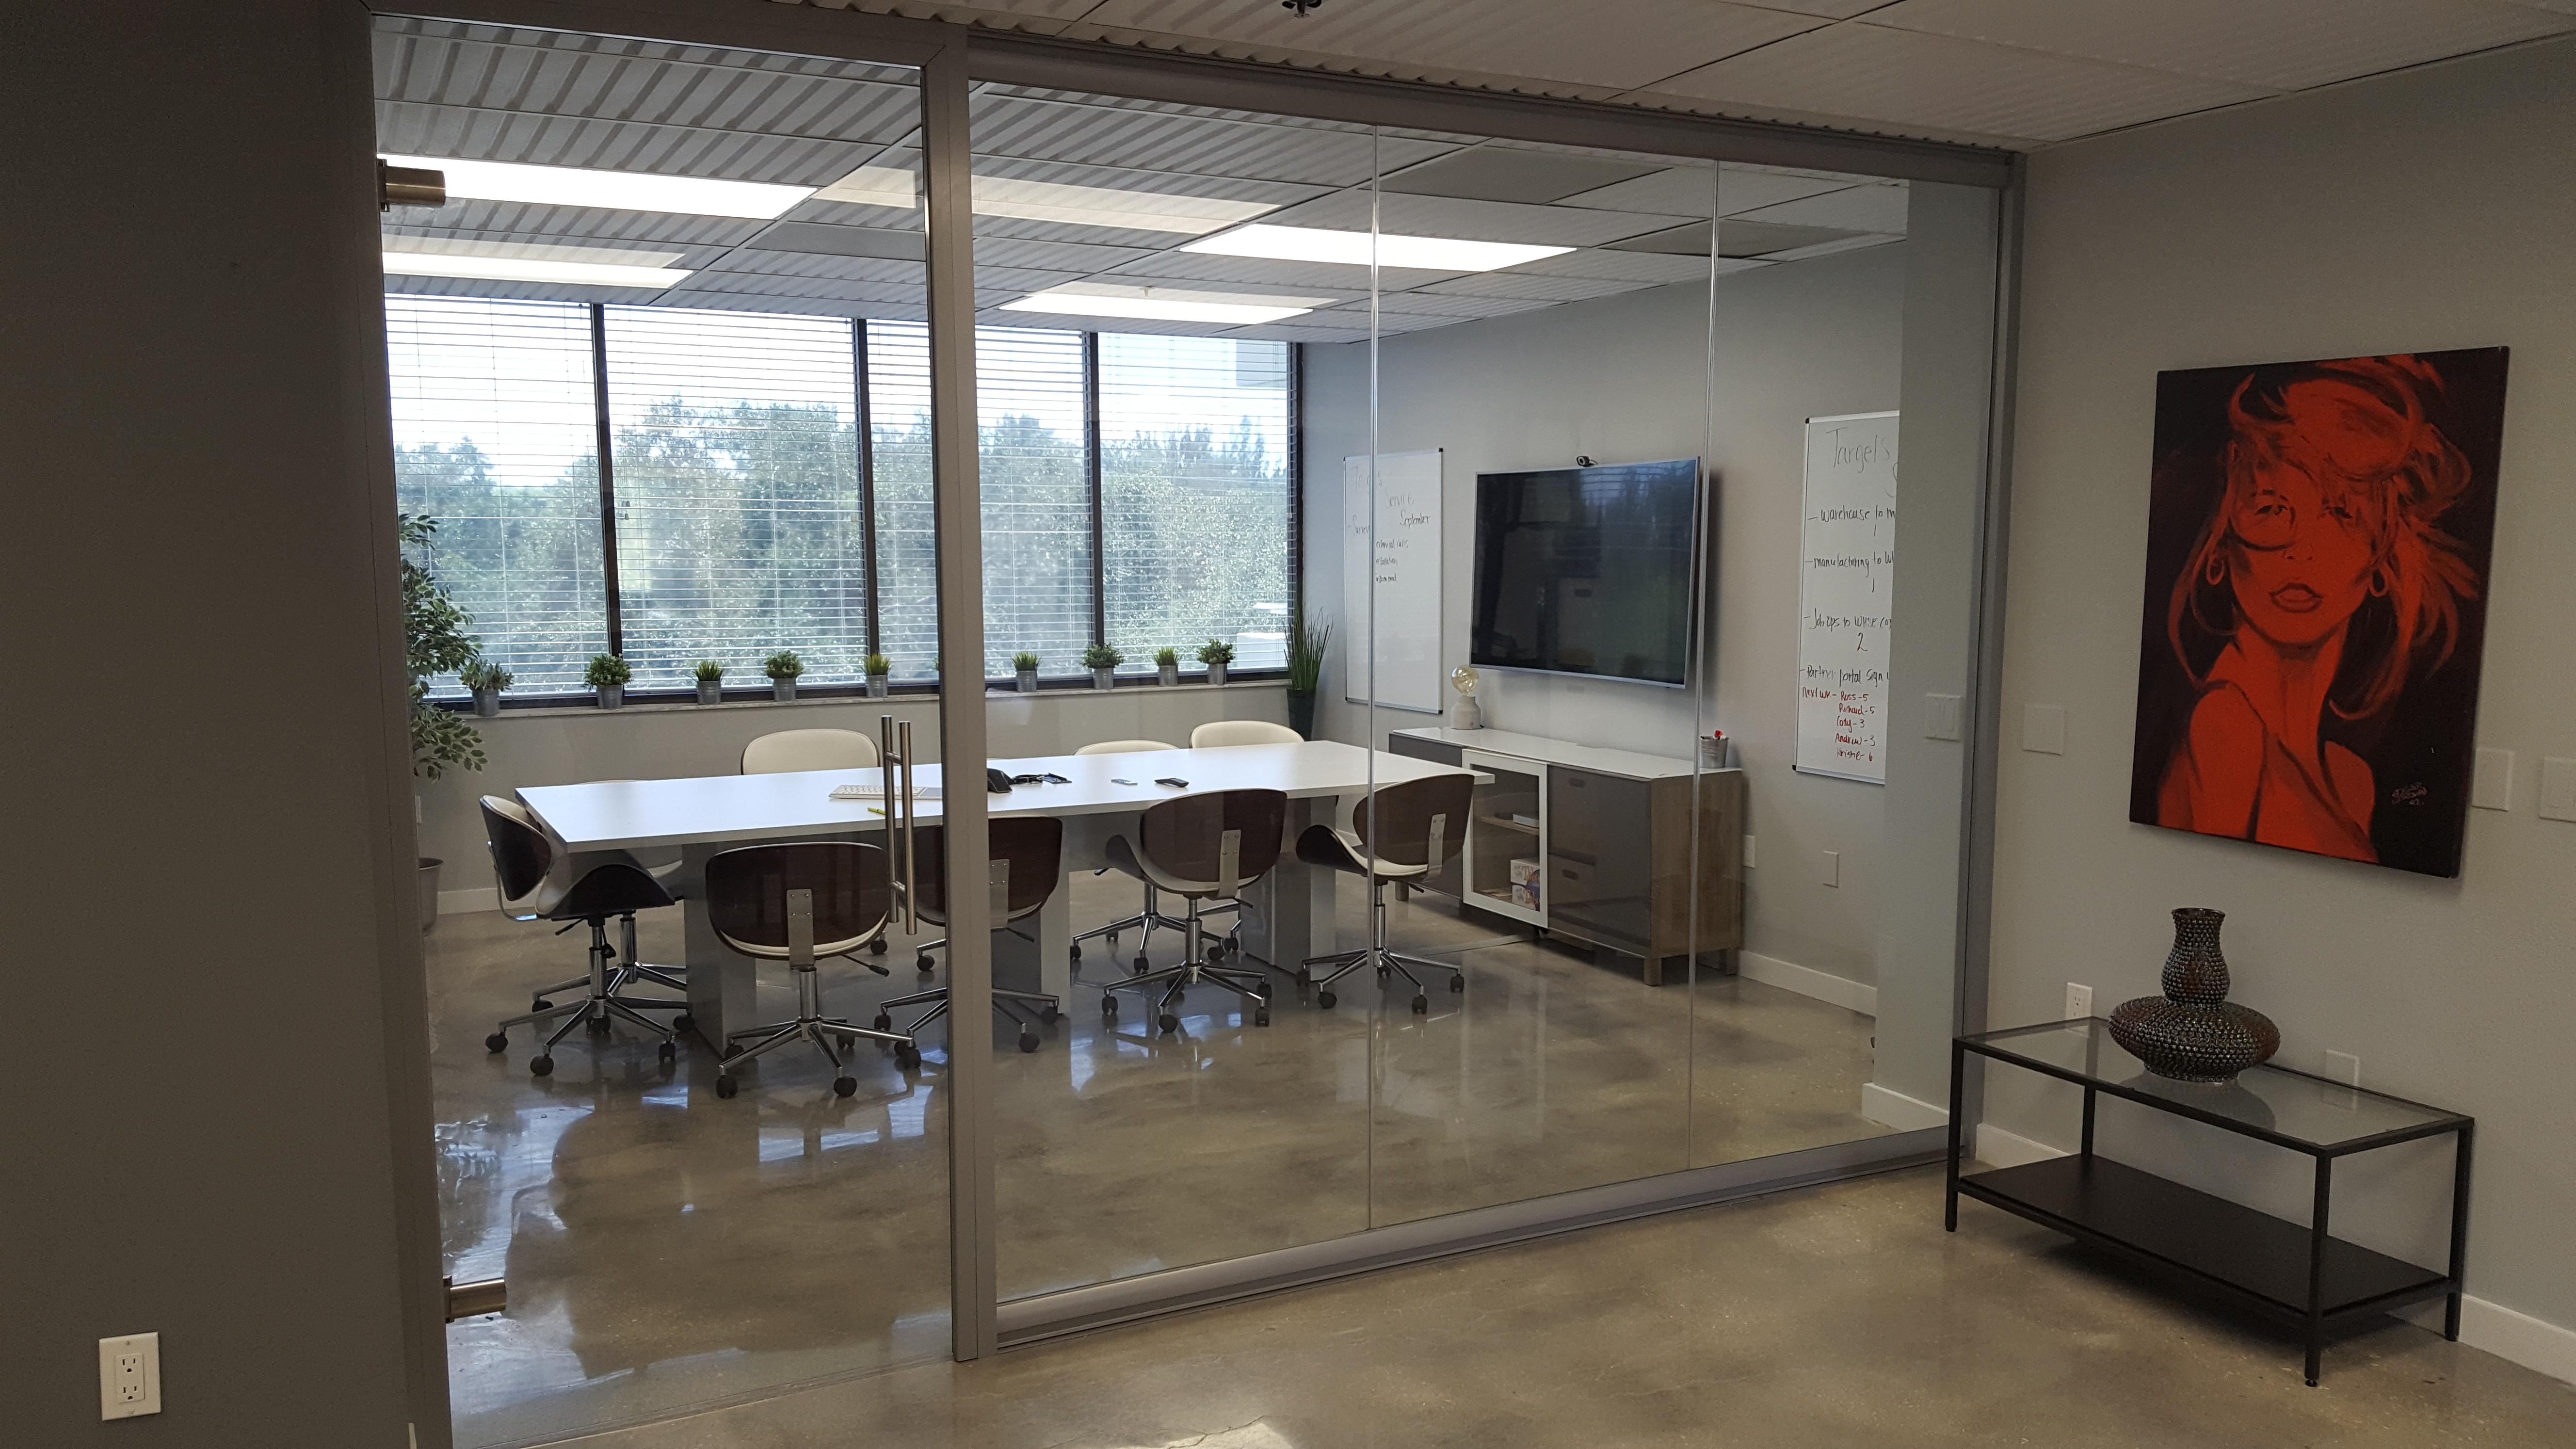 manasota-office-supplies-llc-20170320-172631-4-.jpg